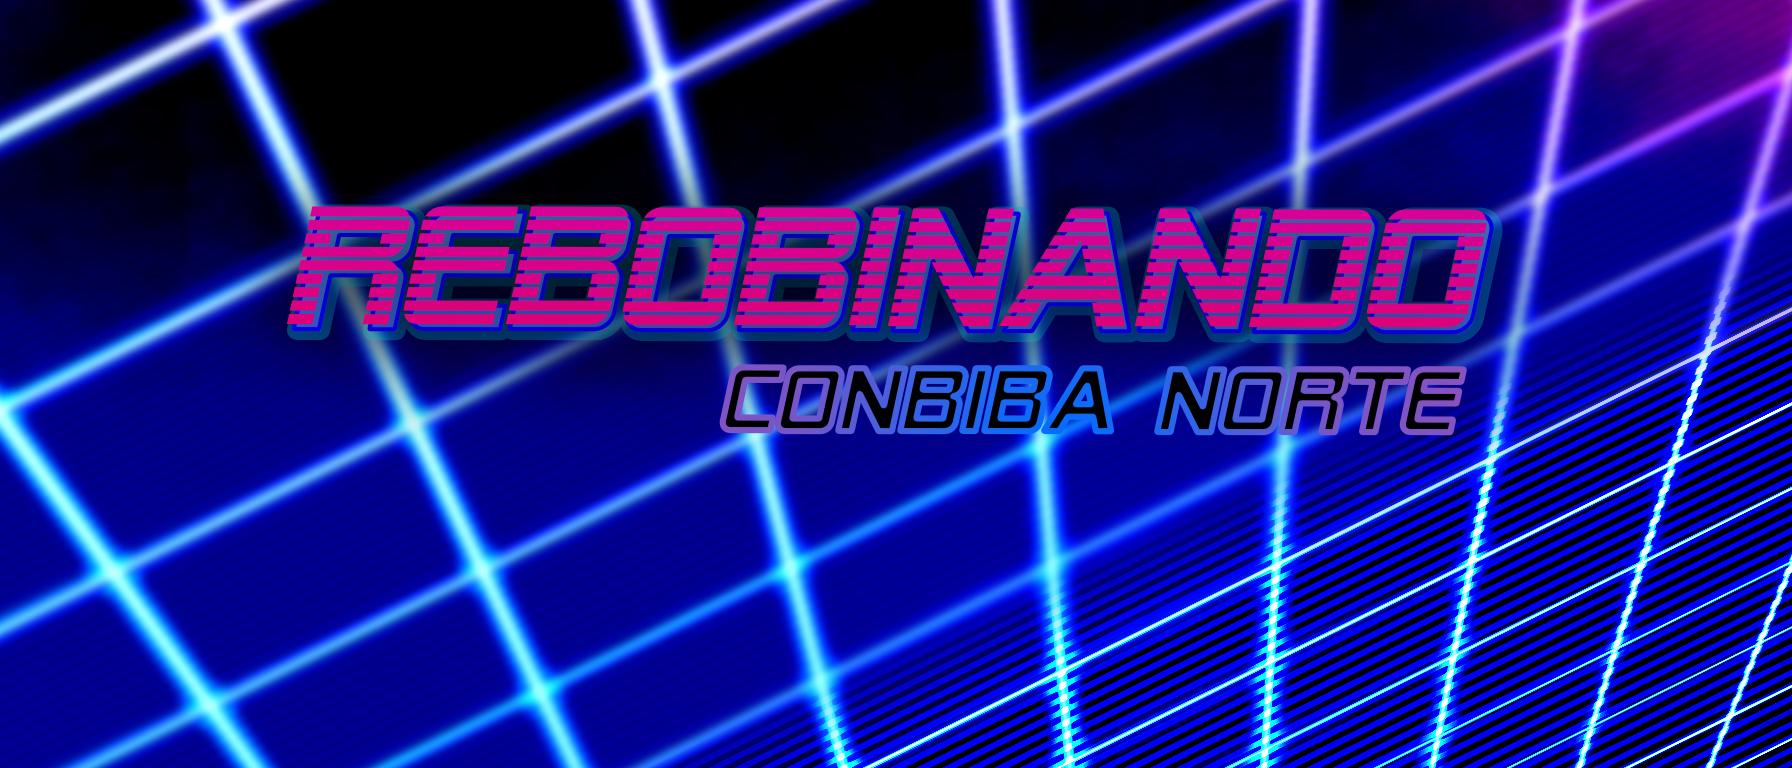 Rebobinando_title.png